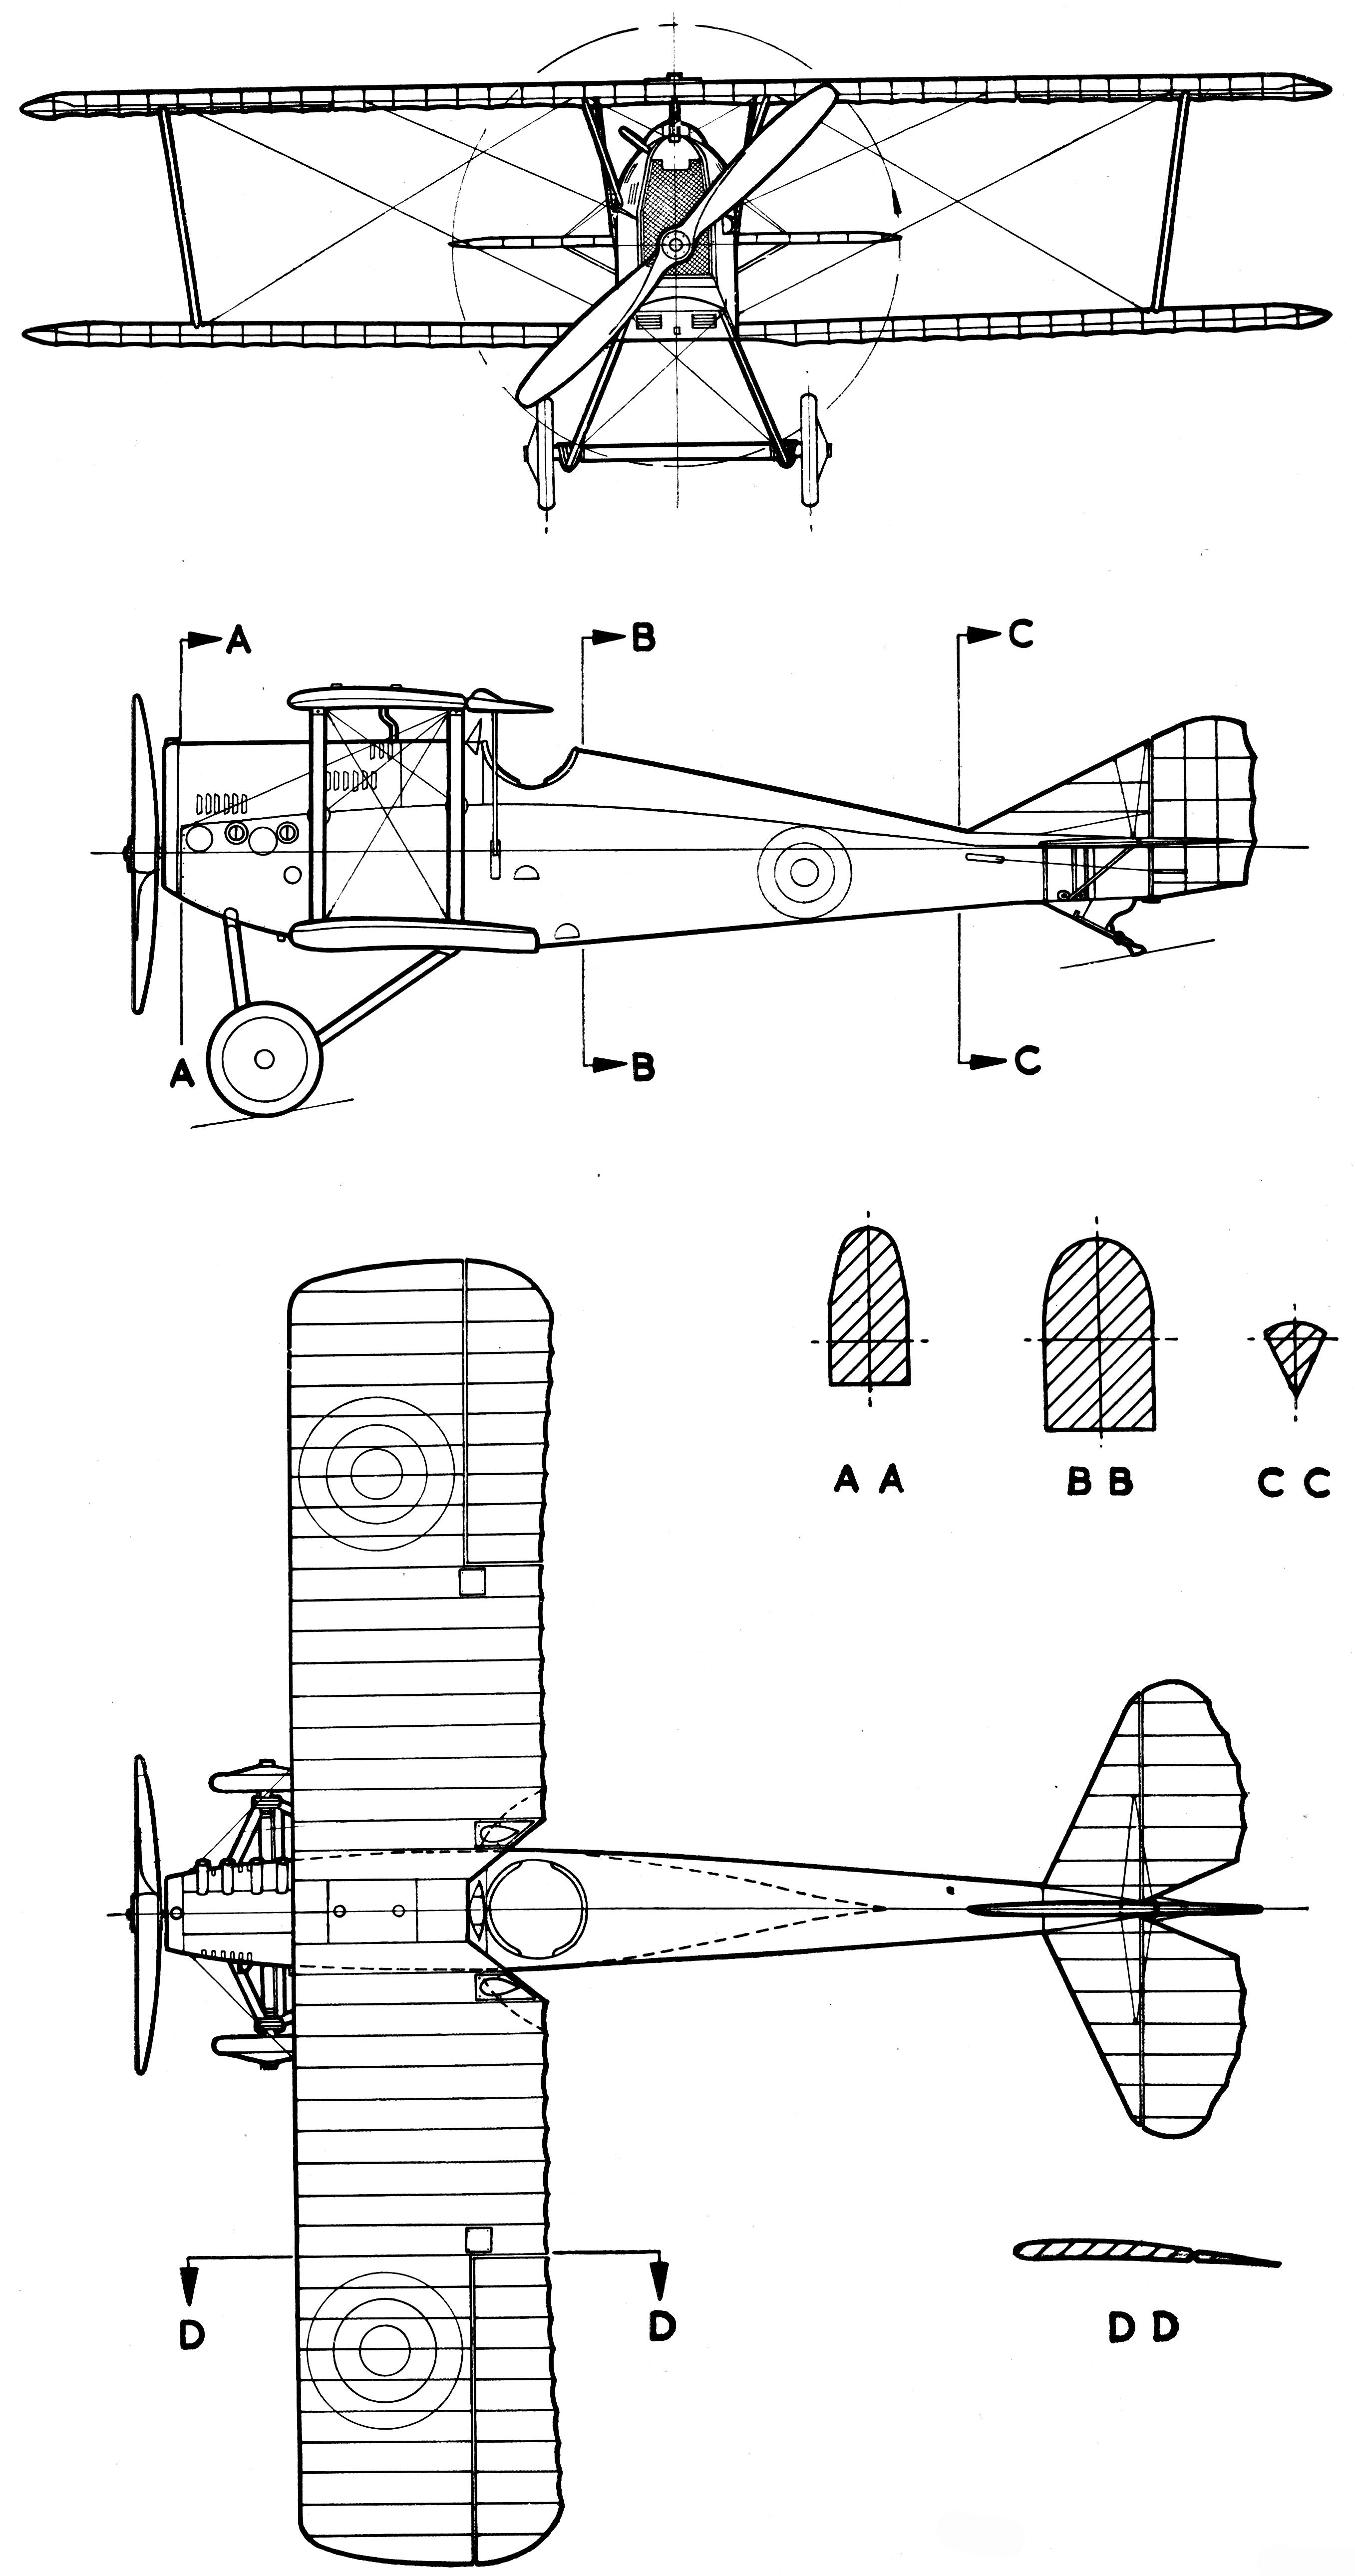 Ansaldo A.1 Balilla blueprint